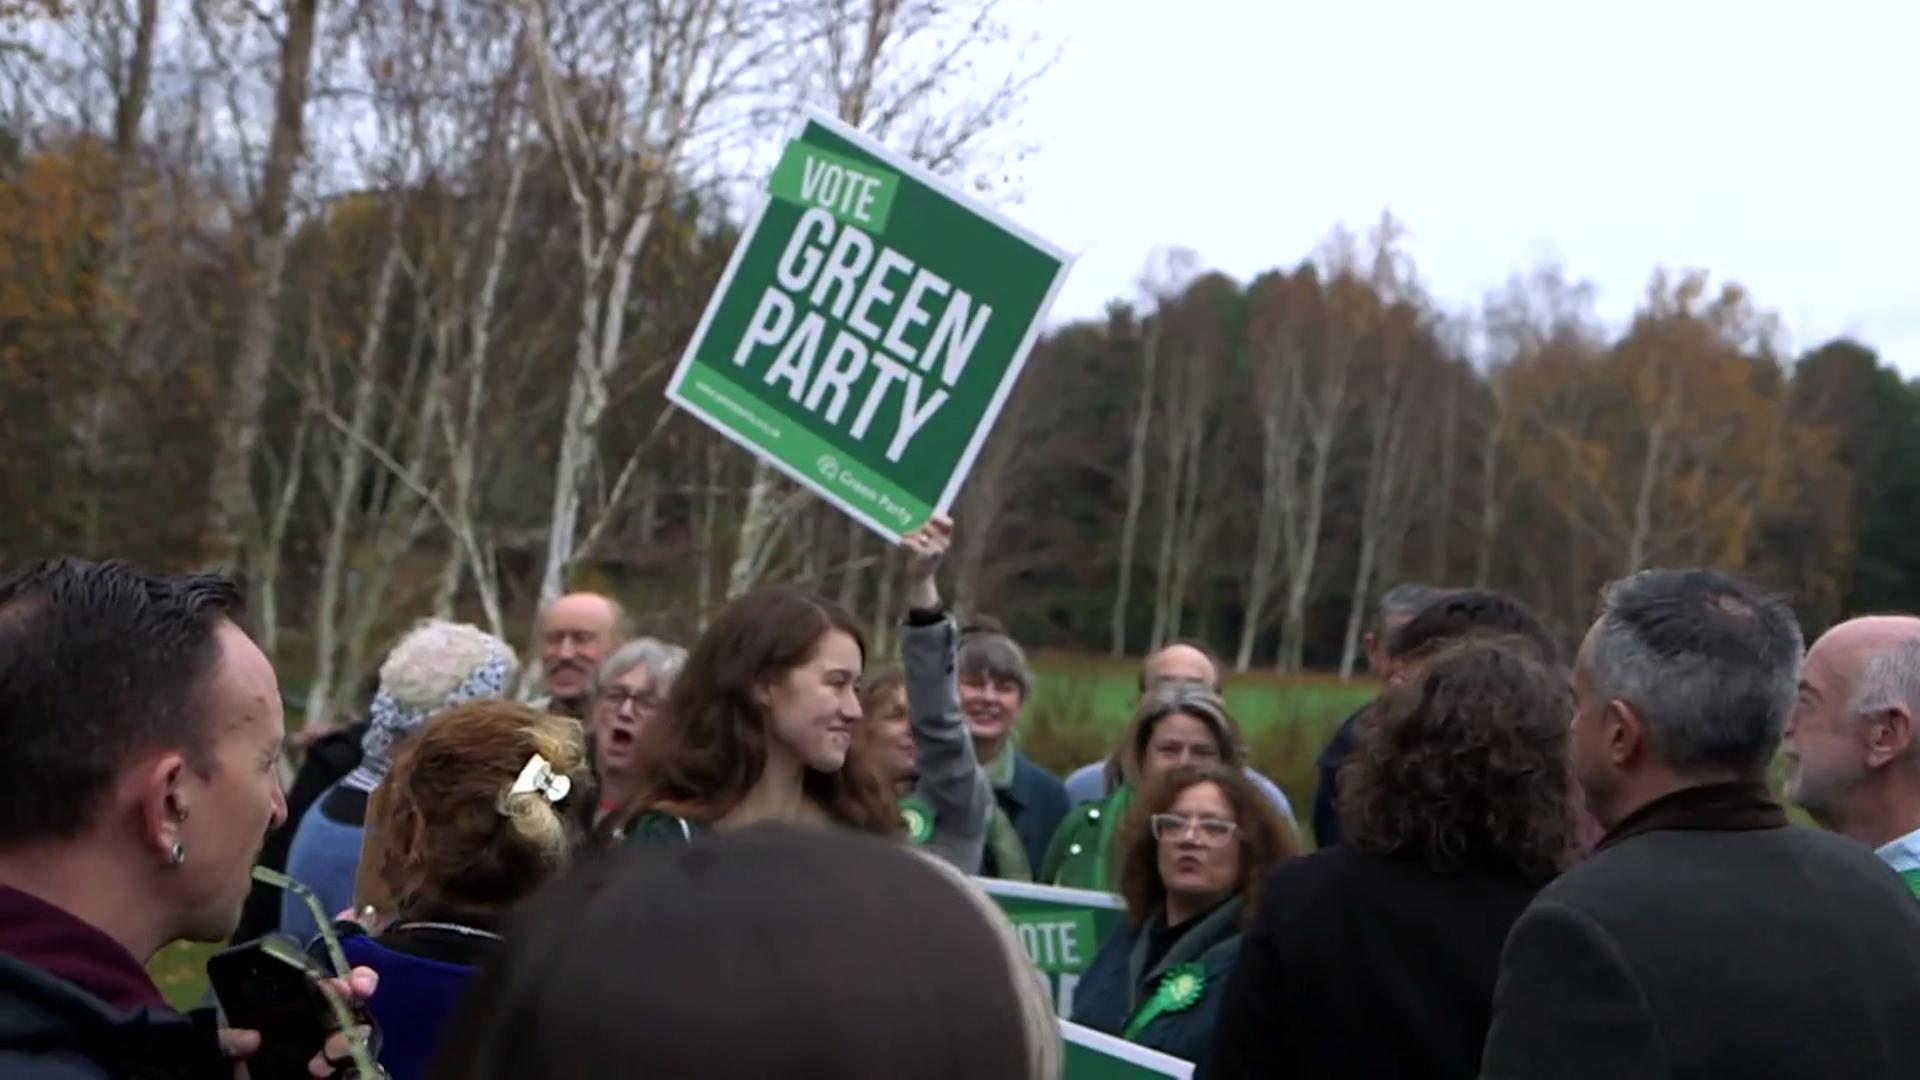 Green Party pledge net zero carbon emissions by 2030